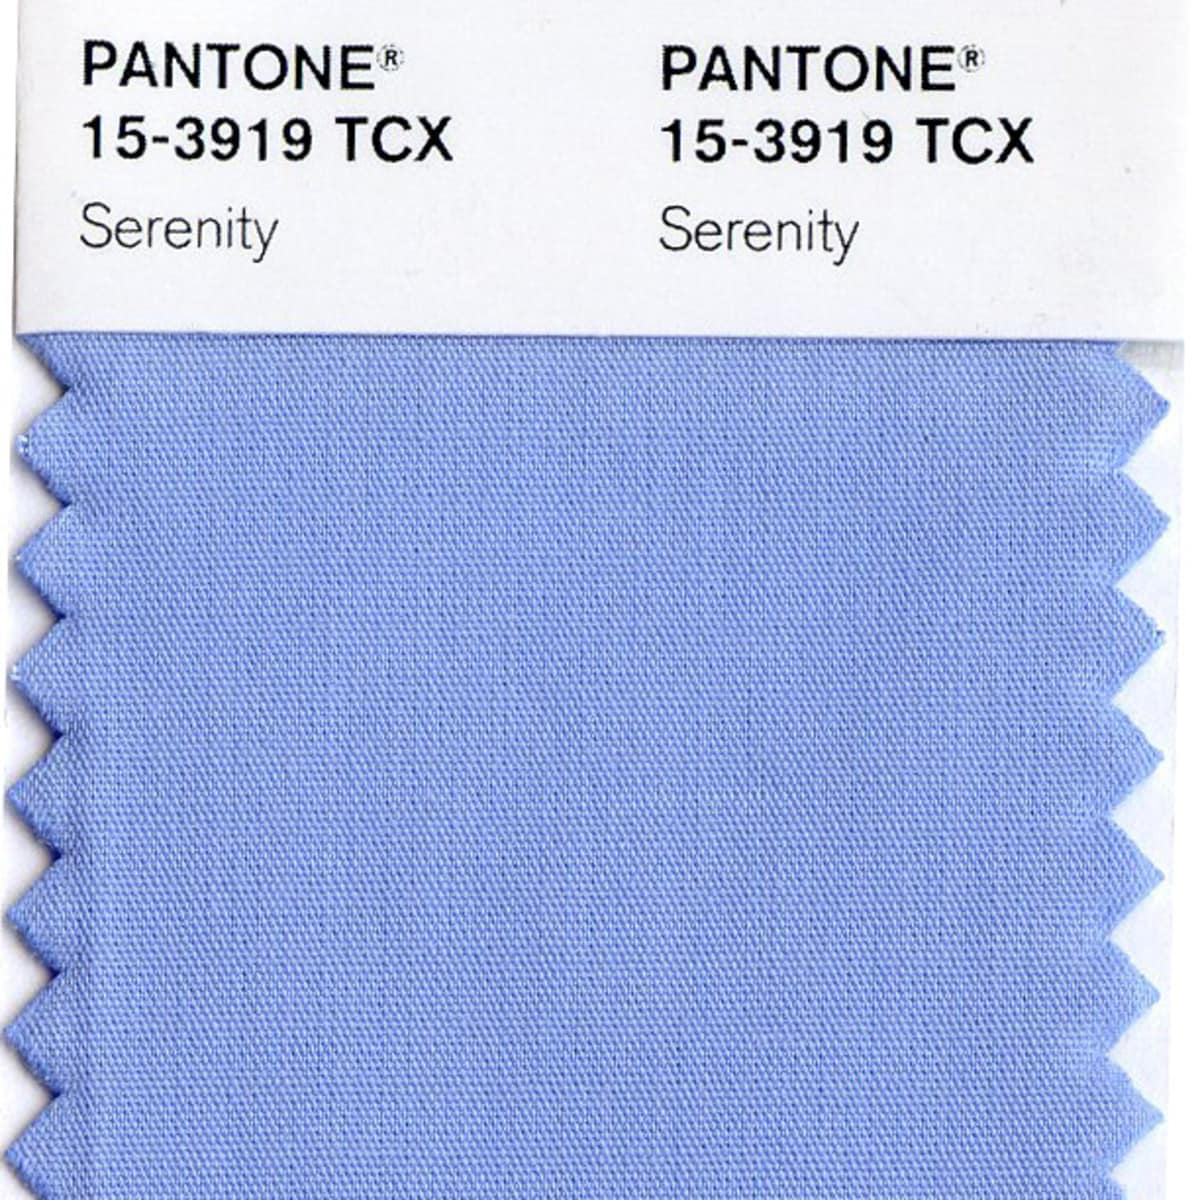 News, Pantone, Serenity, Dec. 2015